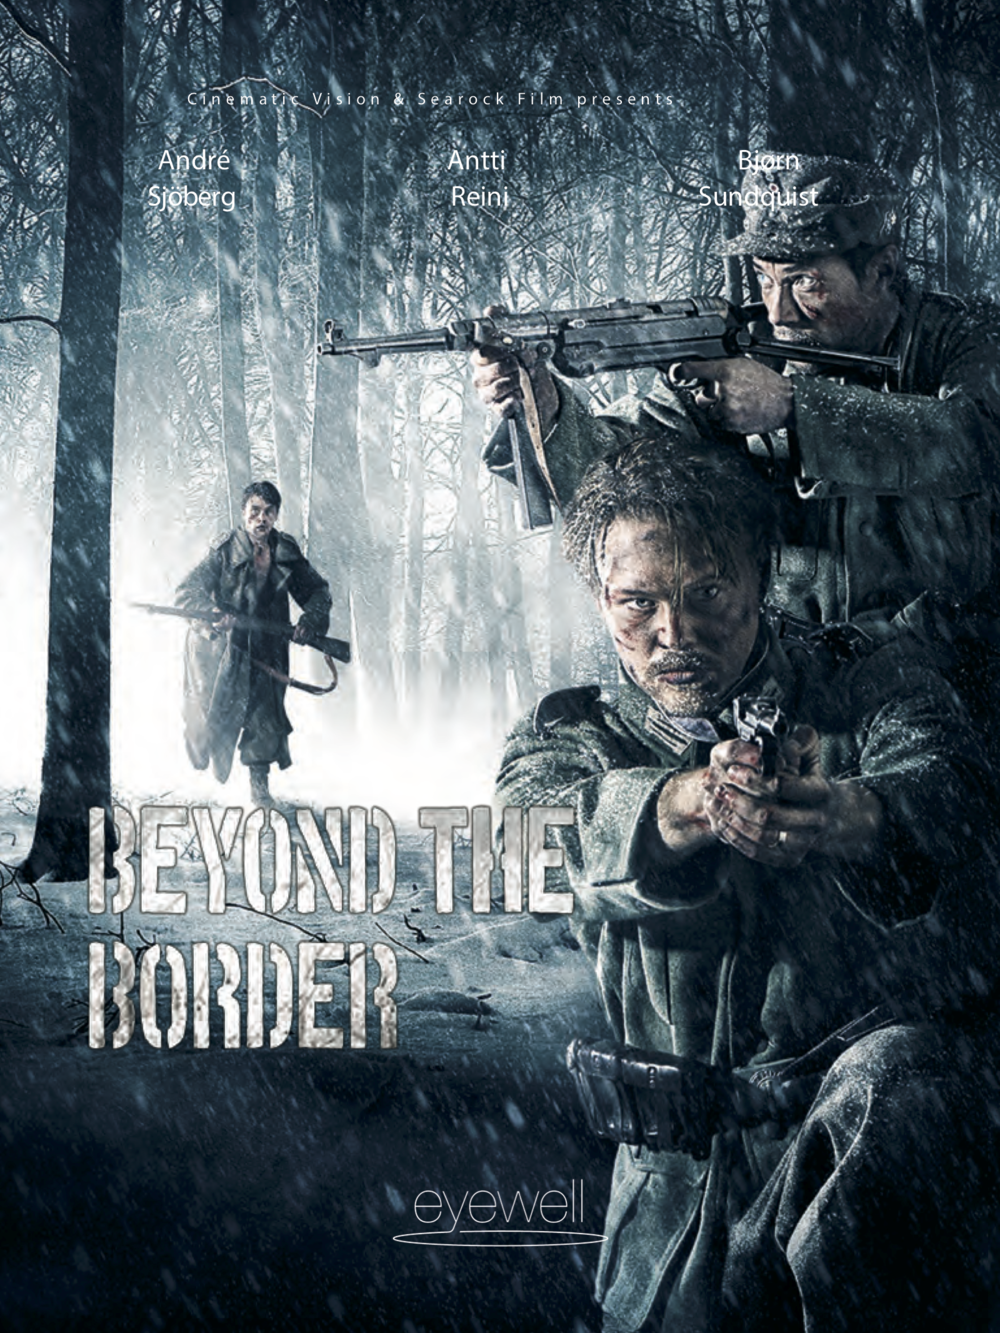 BeyondtheBorderPoster